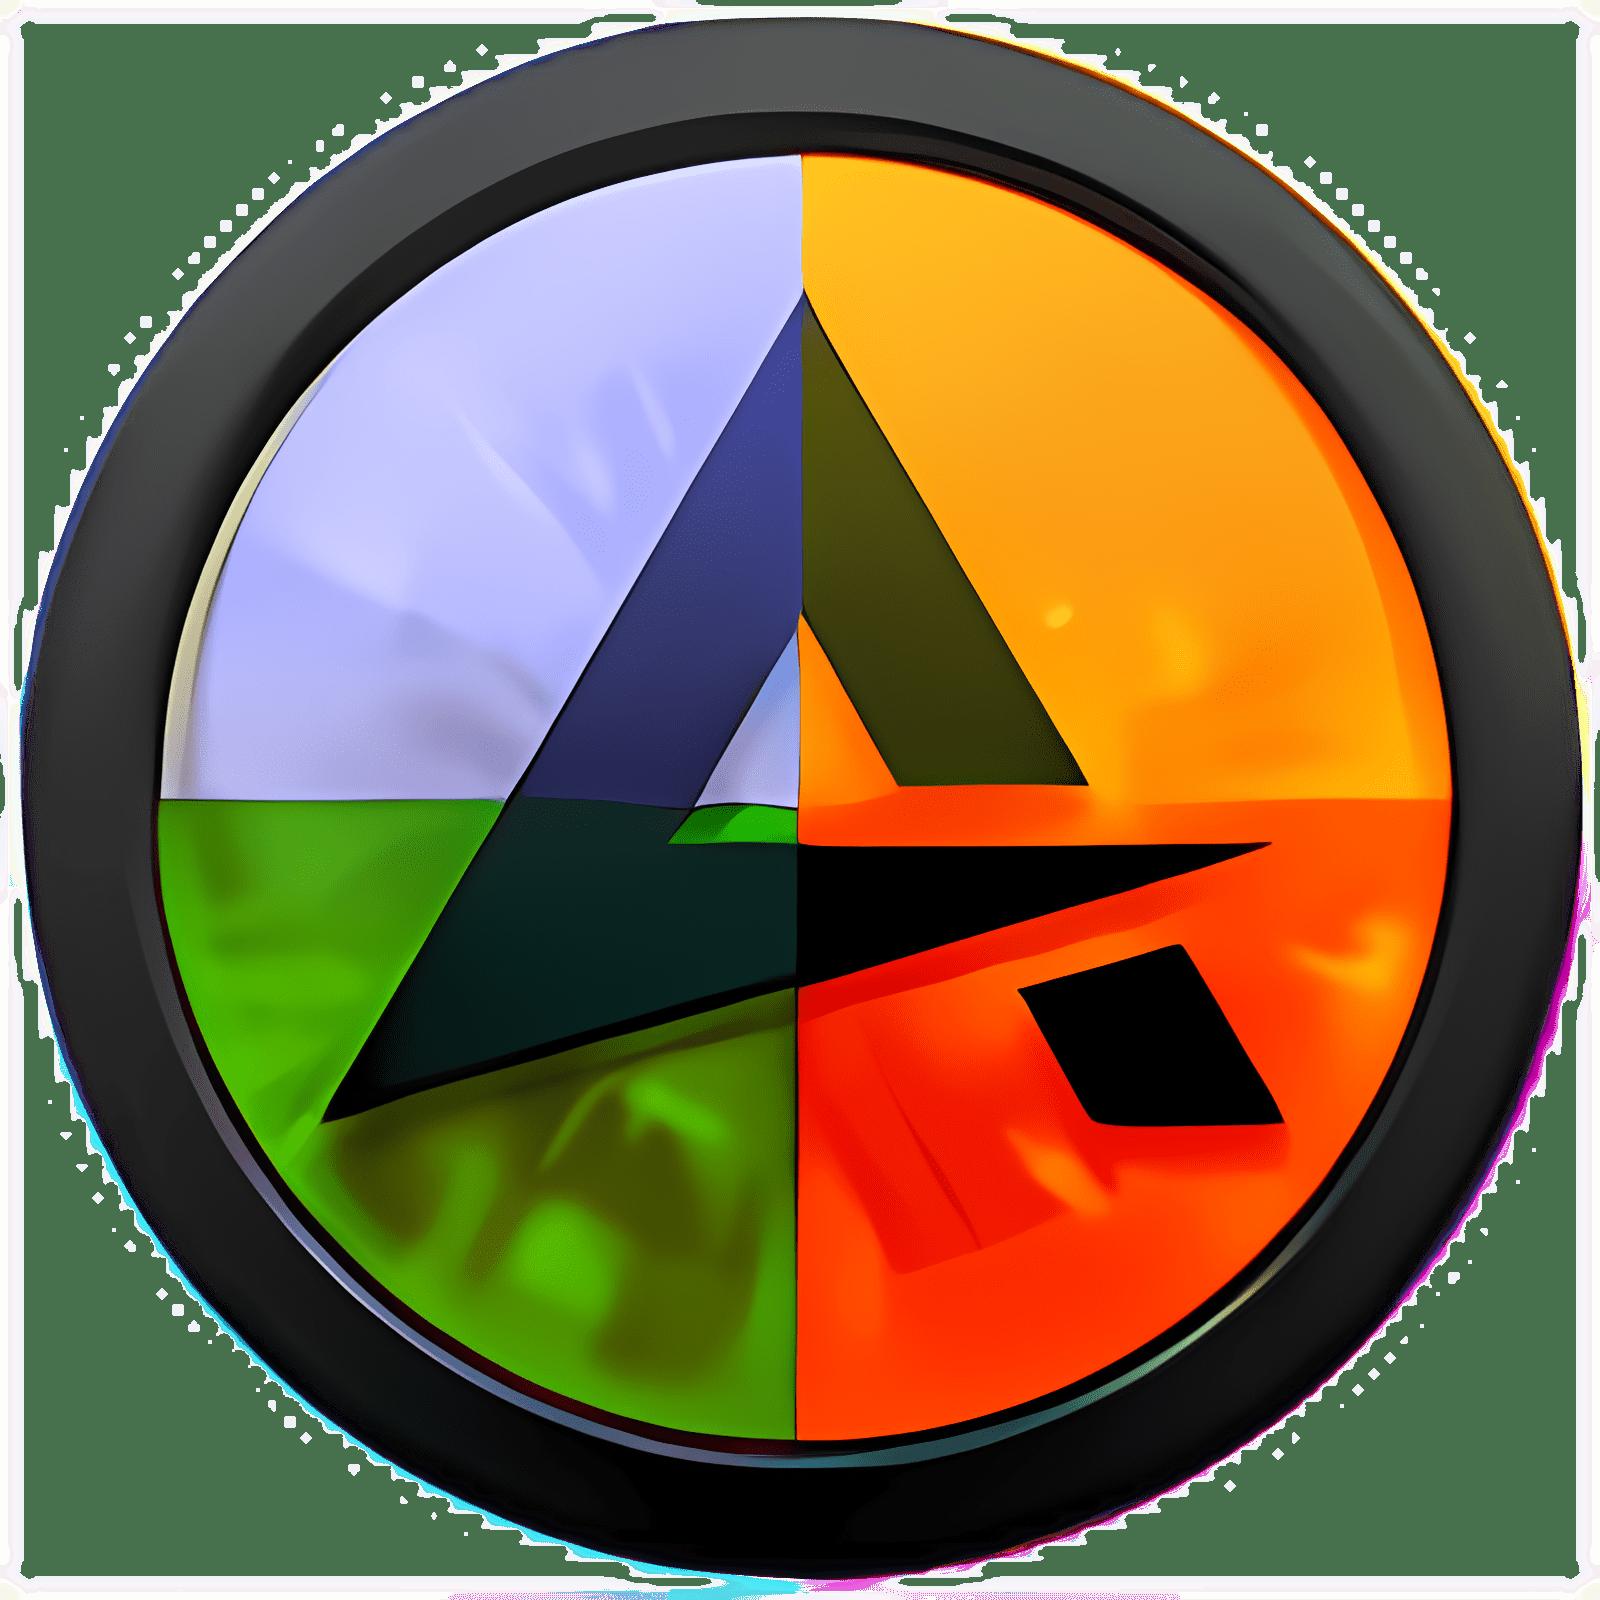 AIMP 2 Skin Editor